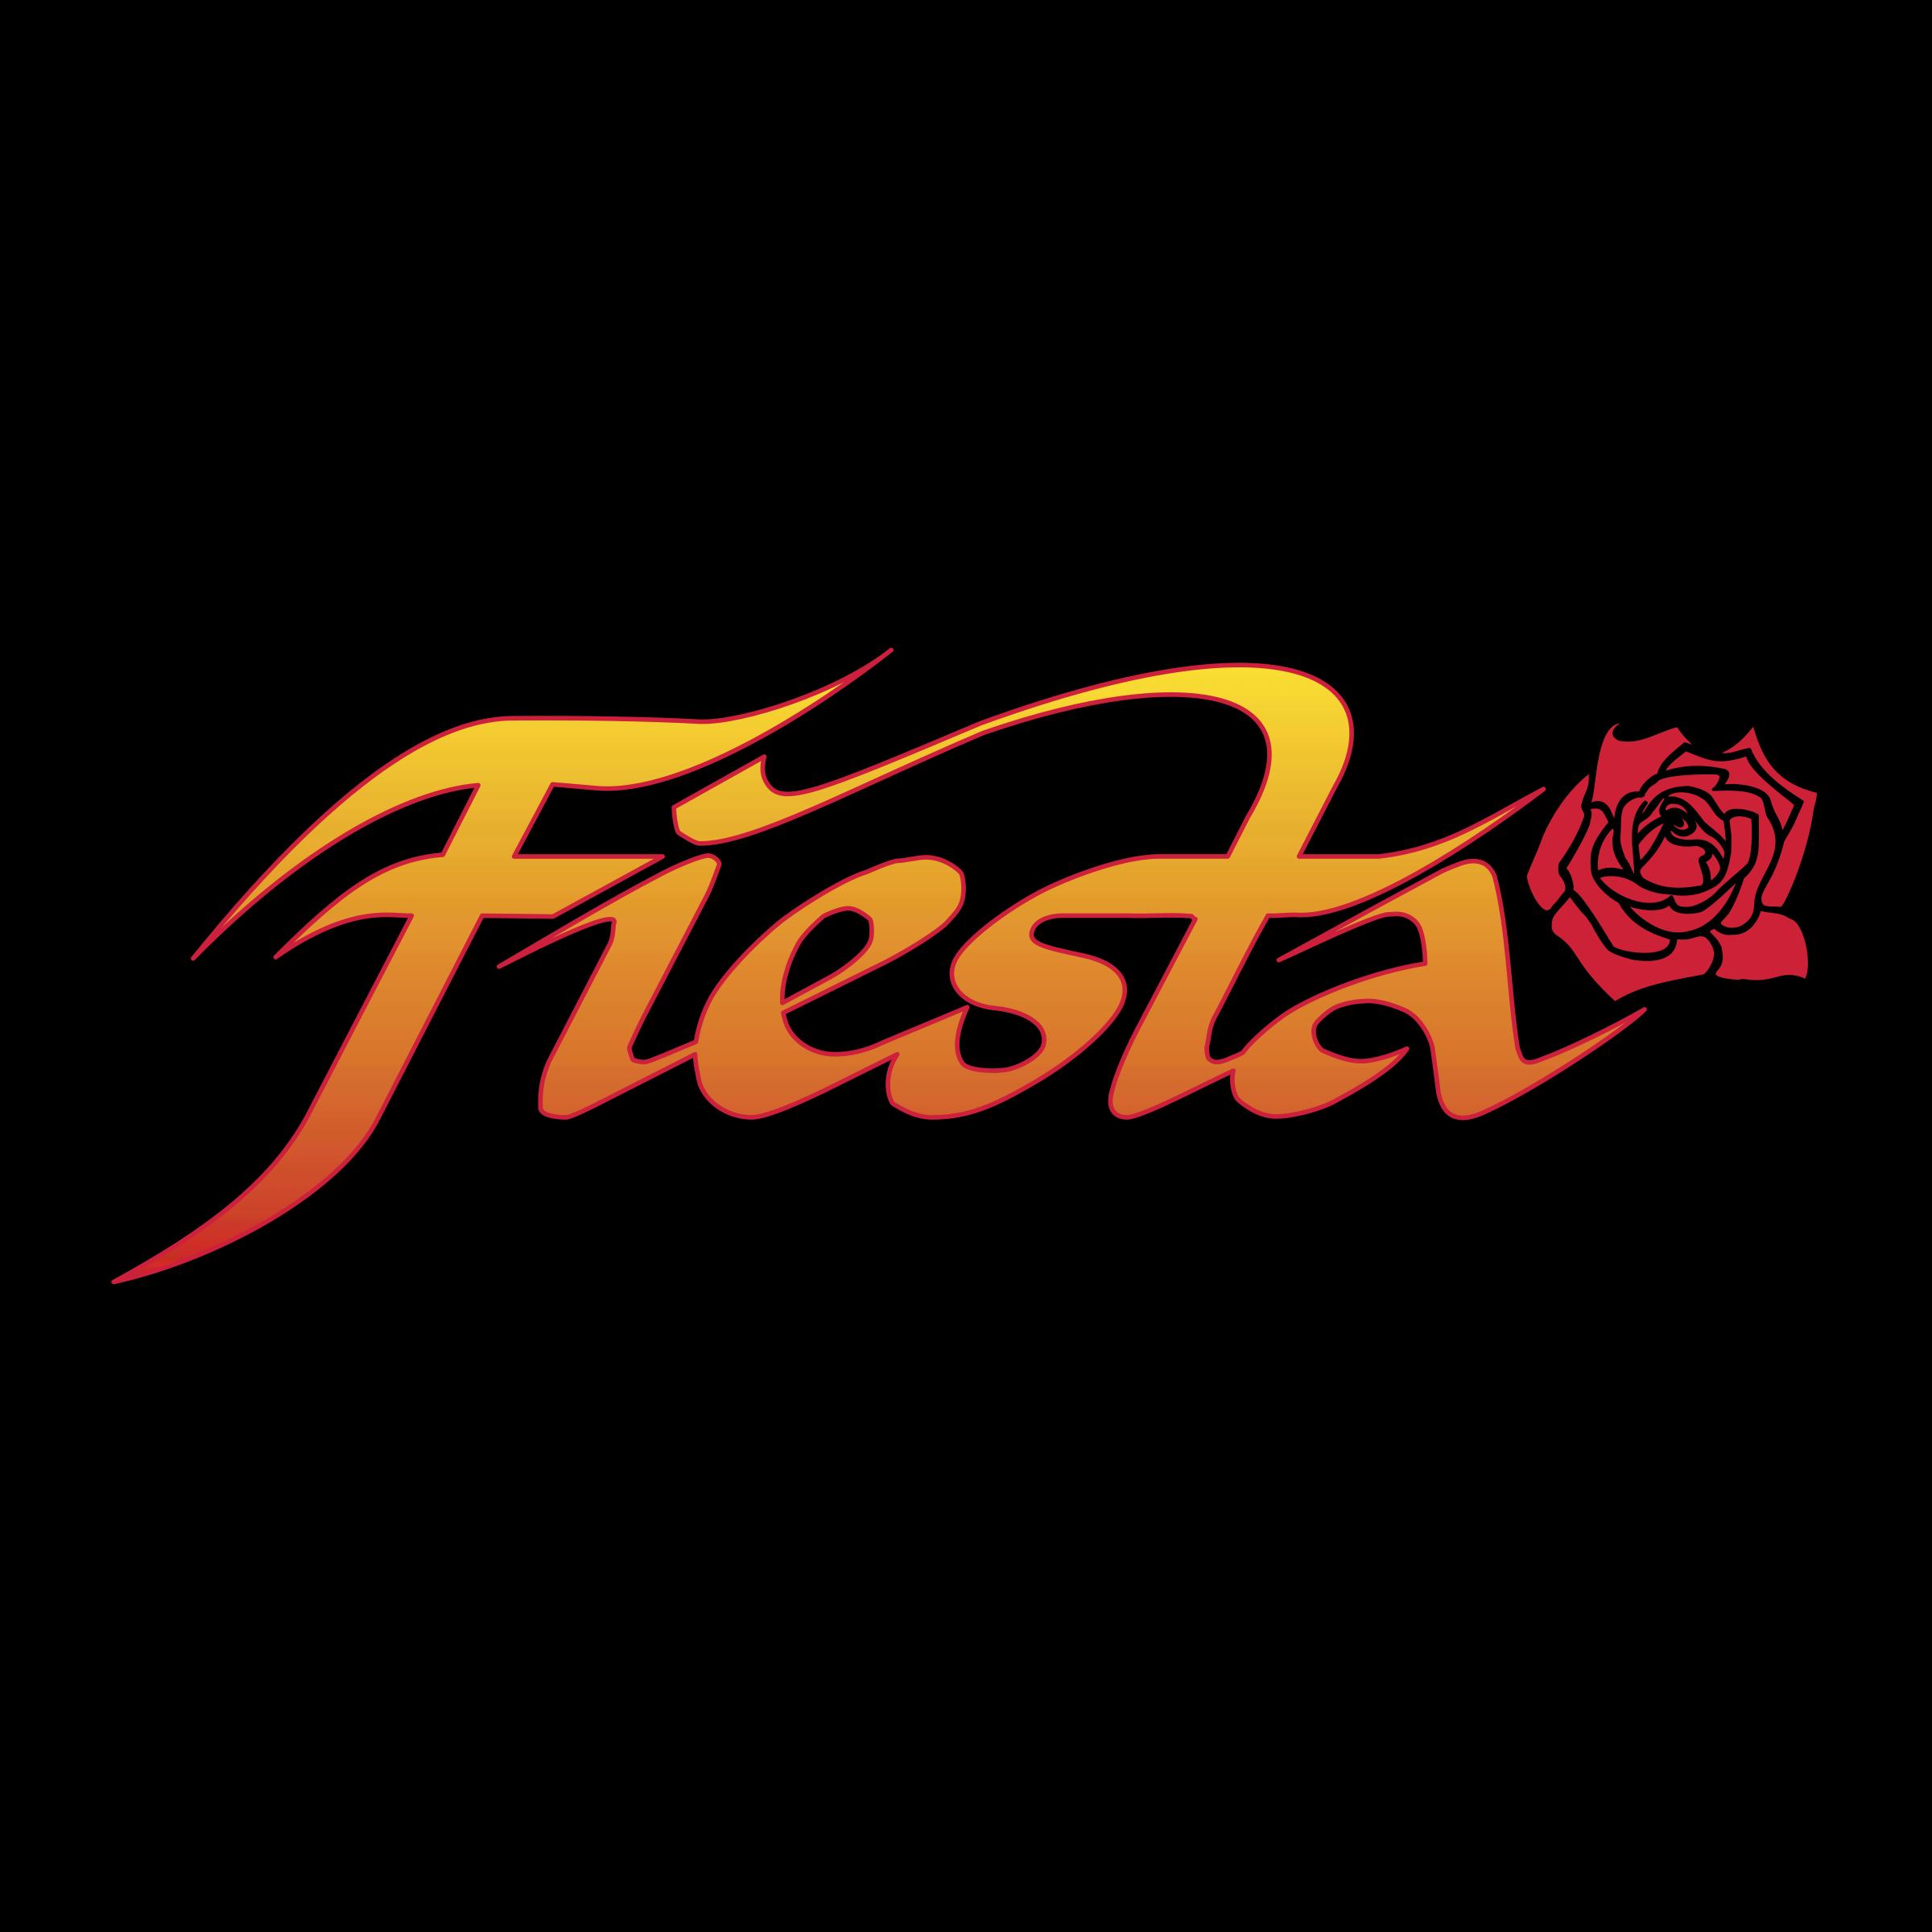 Fiesta Logo PNG Transparent & SVG Vector.